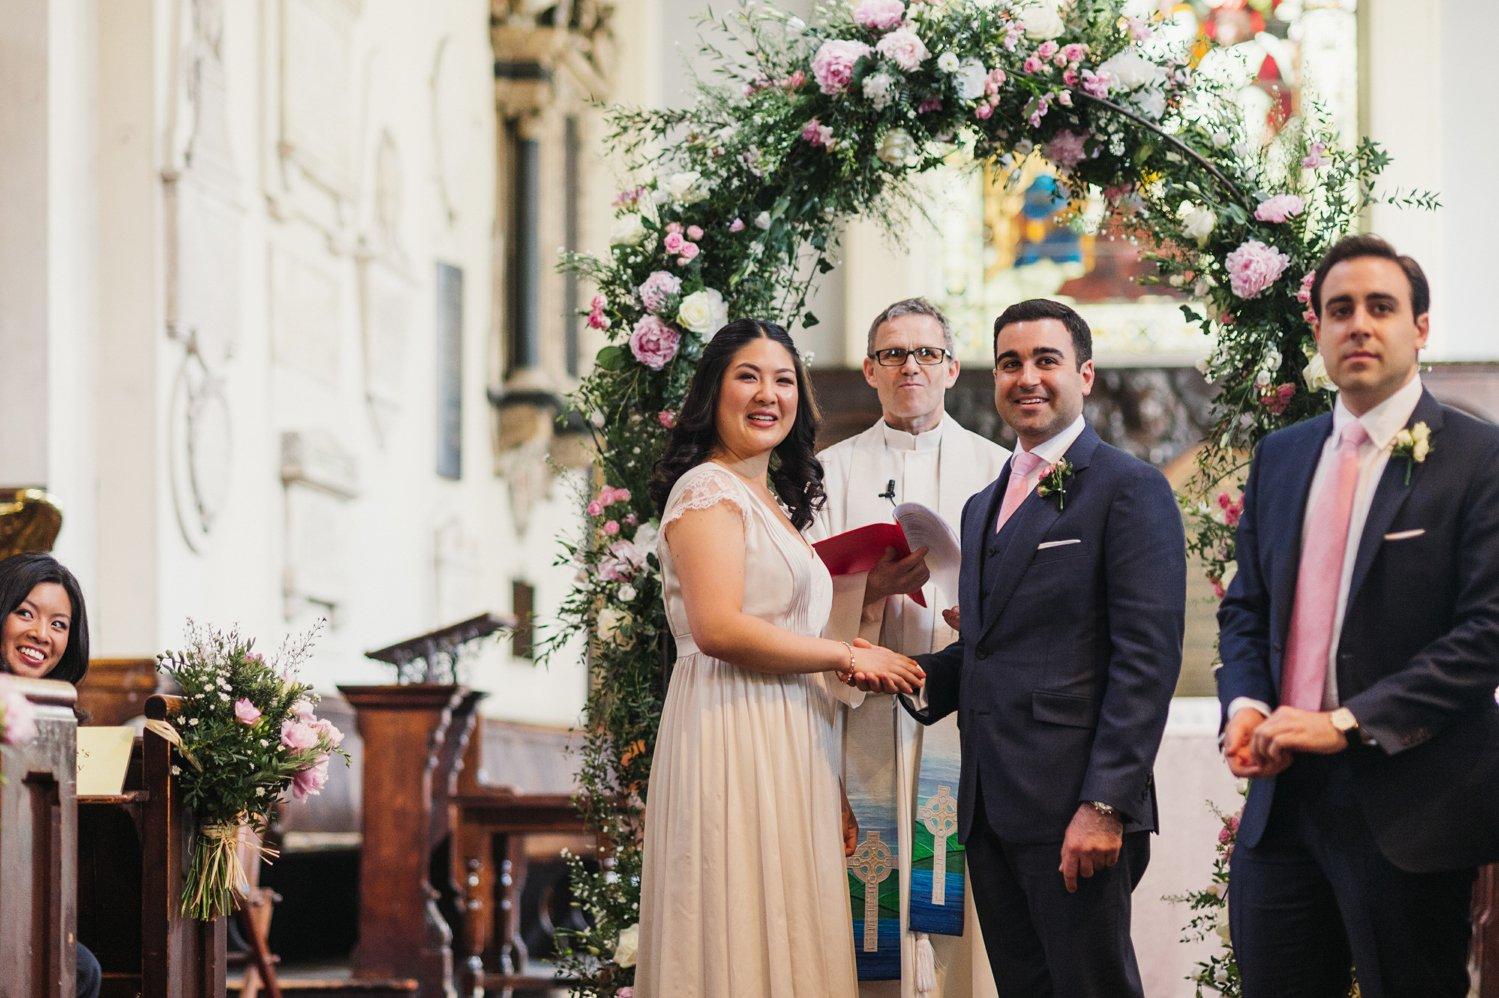 Cheap Wedding Photography Birmingham: Bermondsey Wedding Photography